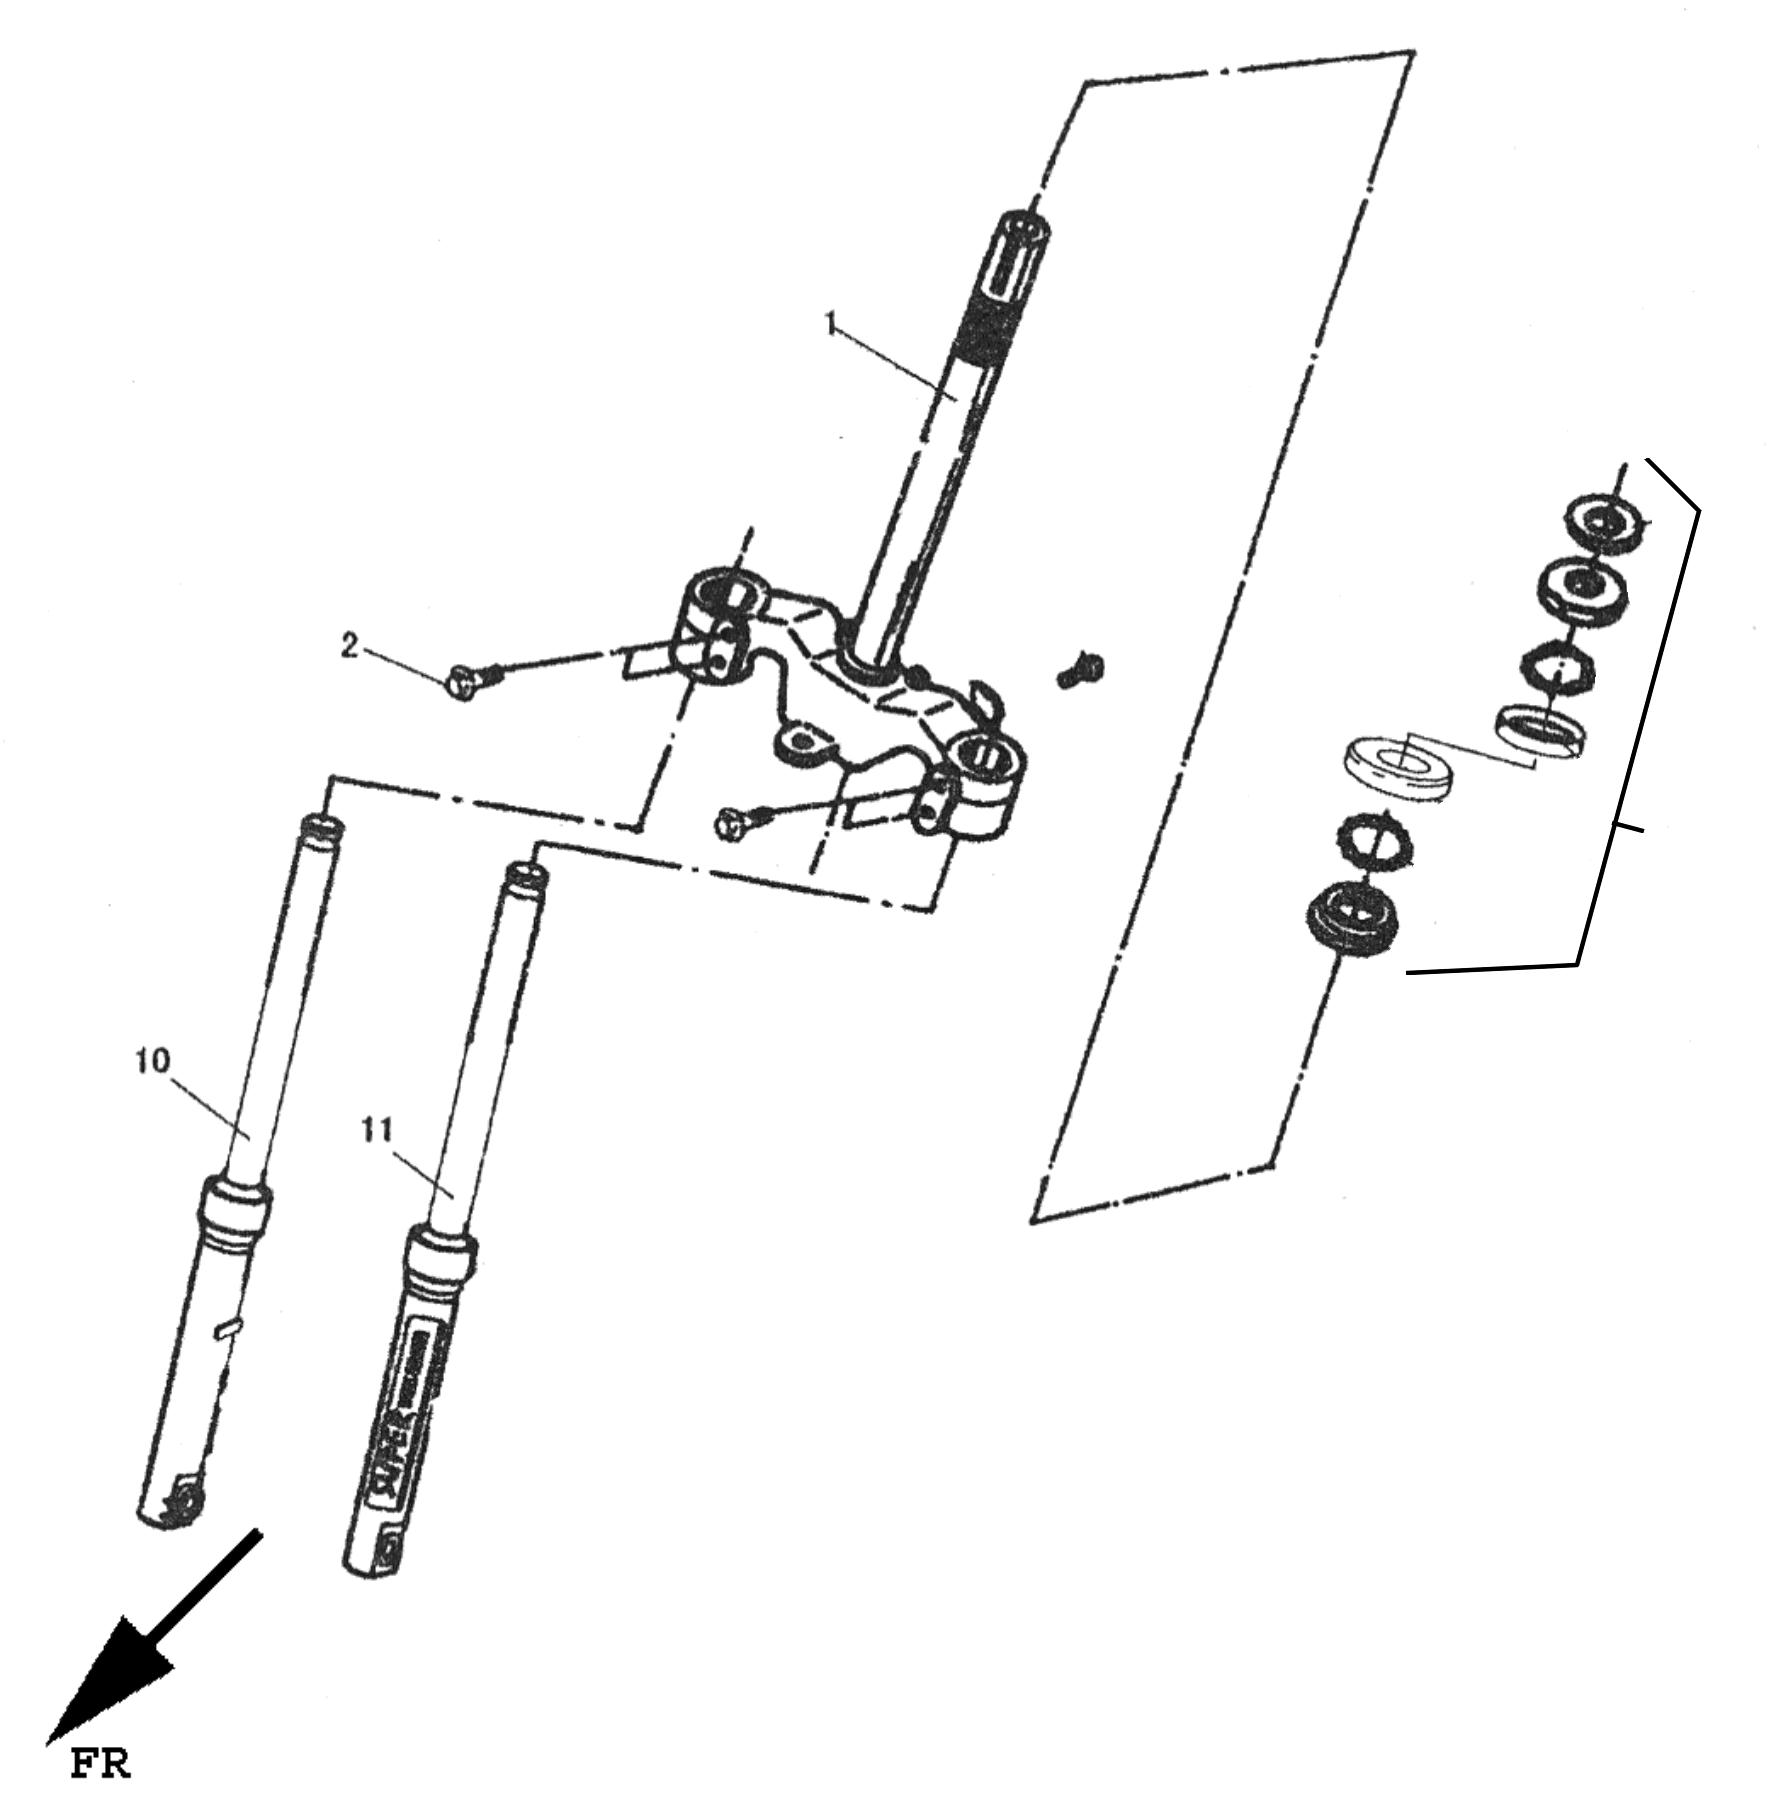 Vorderradgabel (Scheibenbremse), Kotflügel vorn